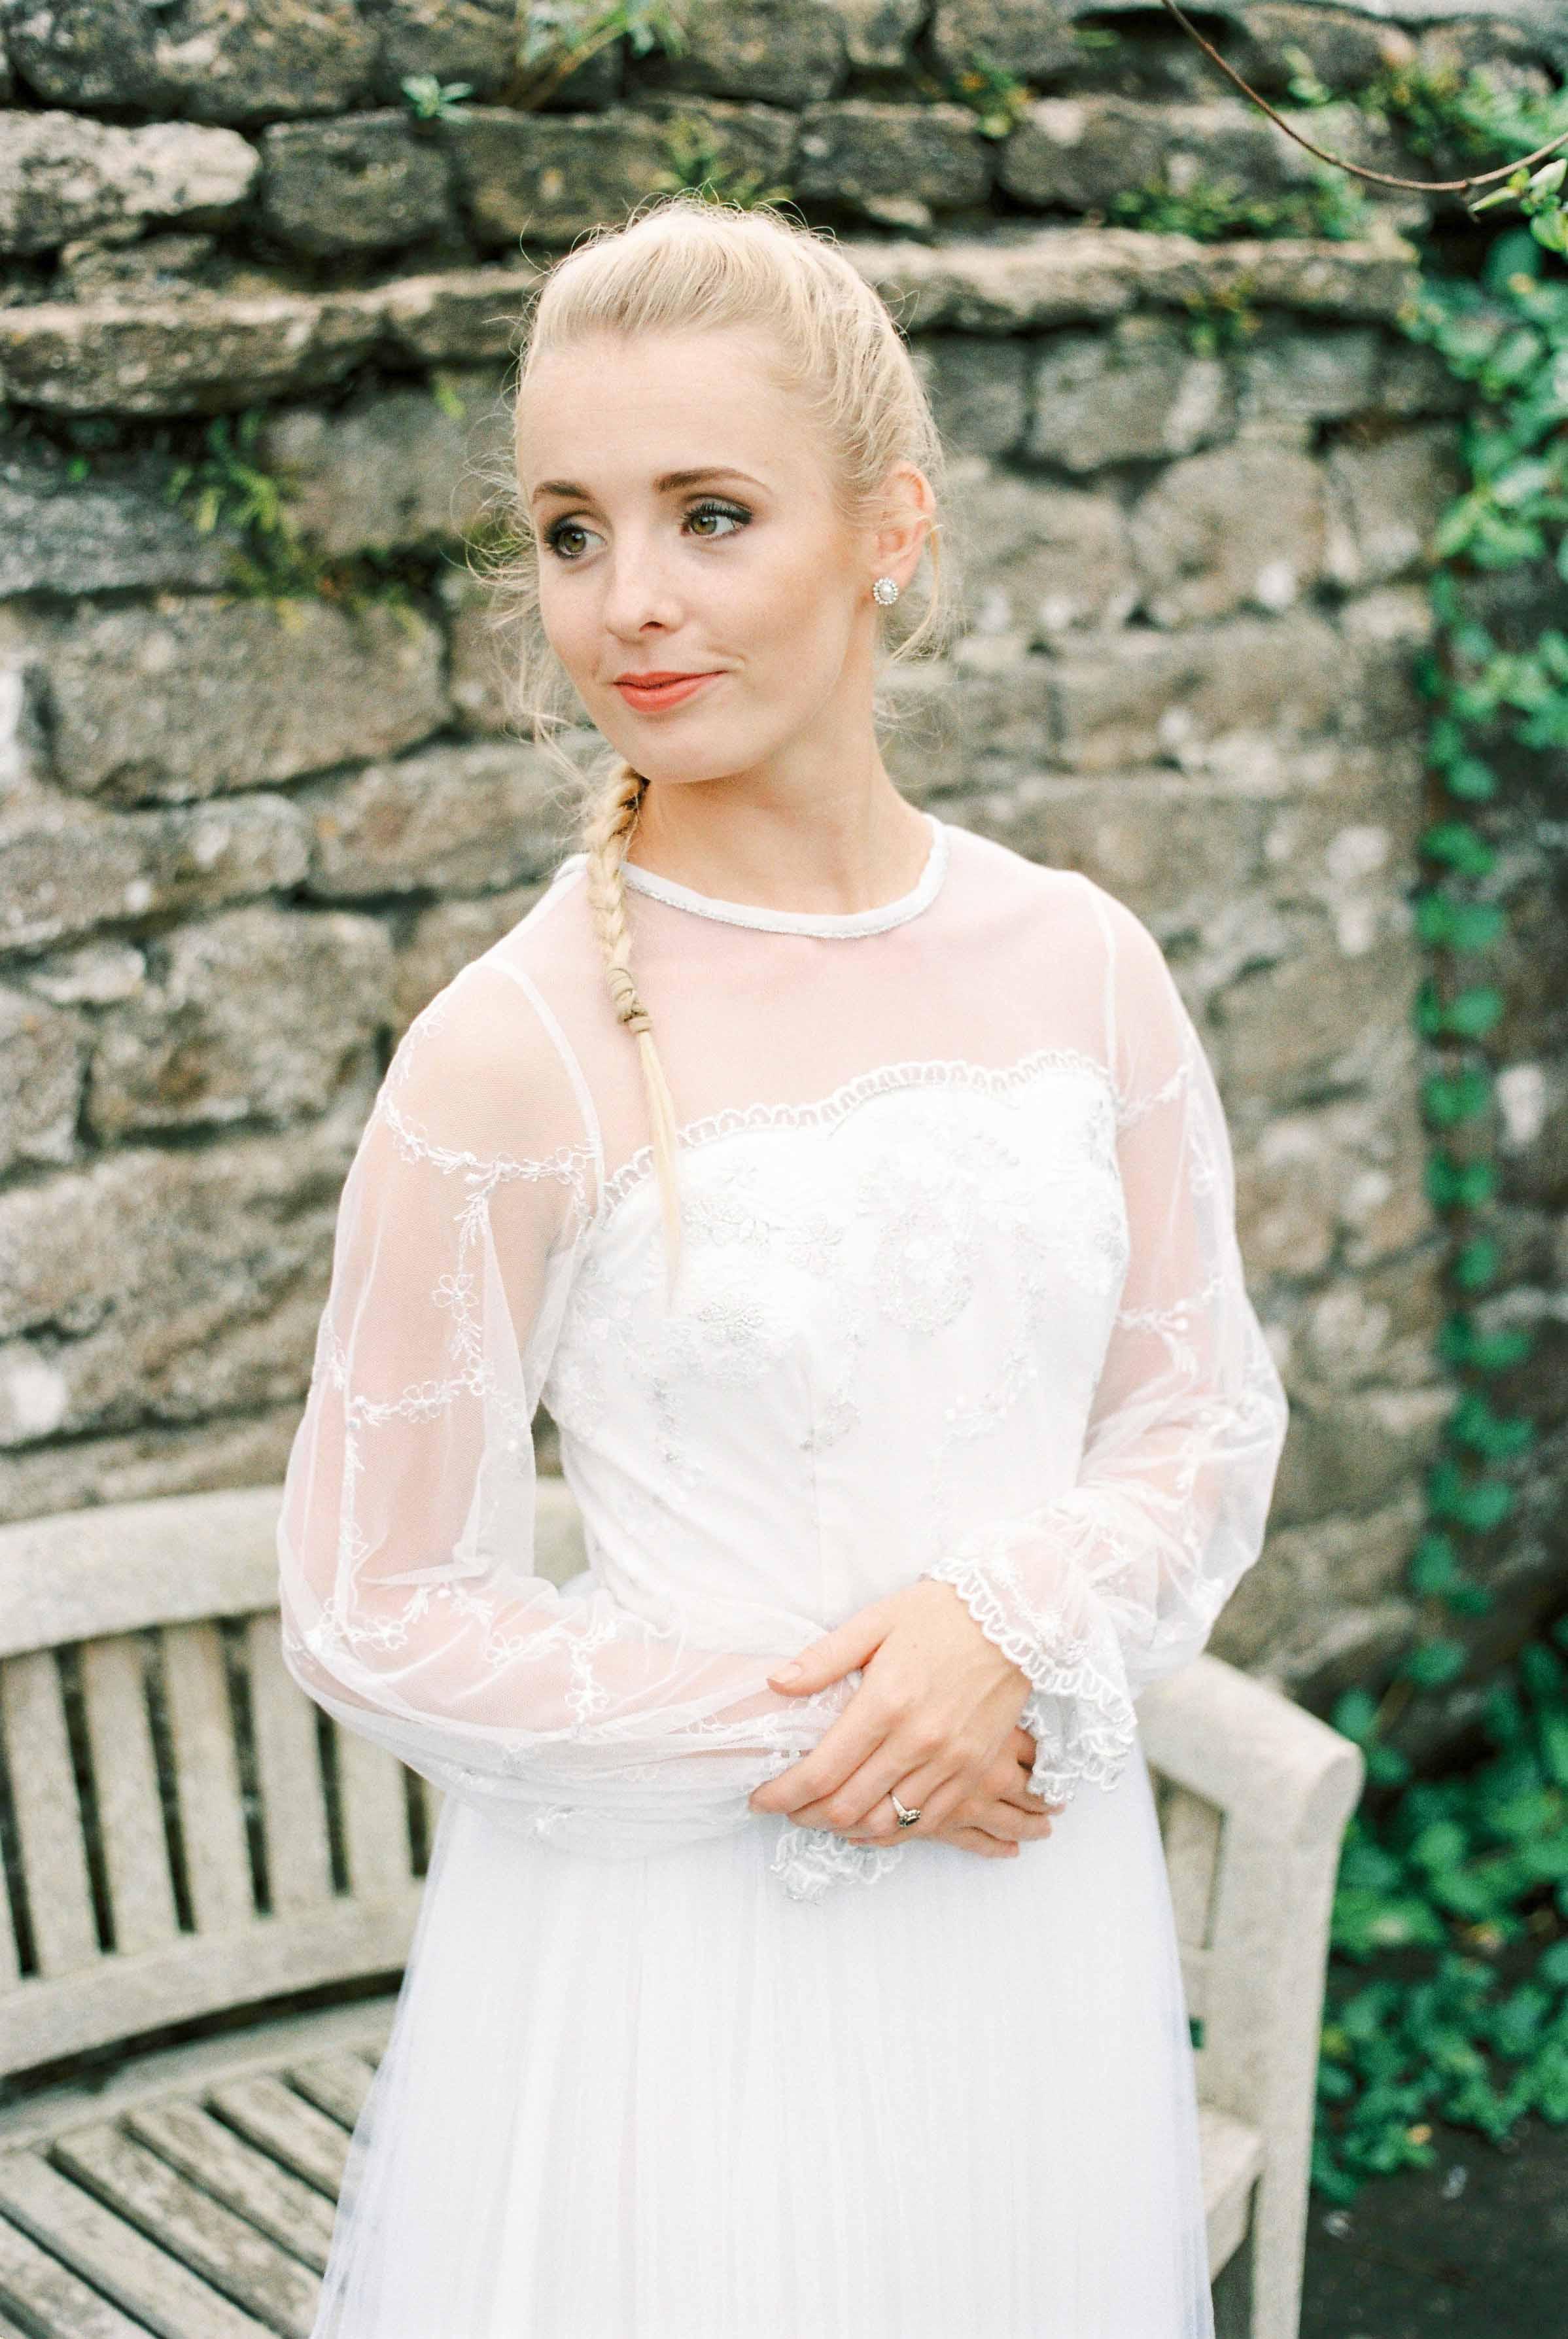 dorset-fine-art-wedding-photographer_amelia_carmencita_lores-6-of-24